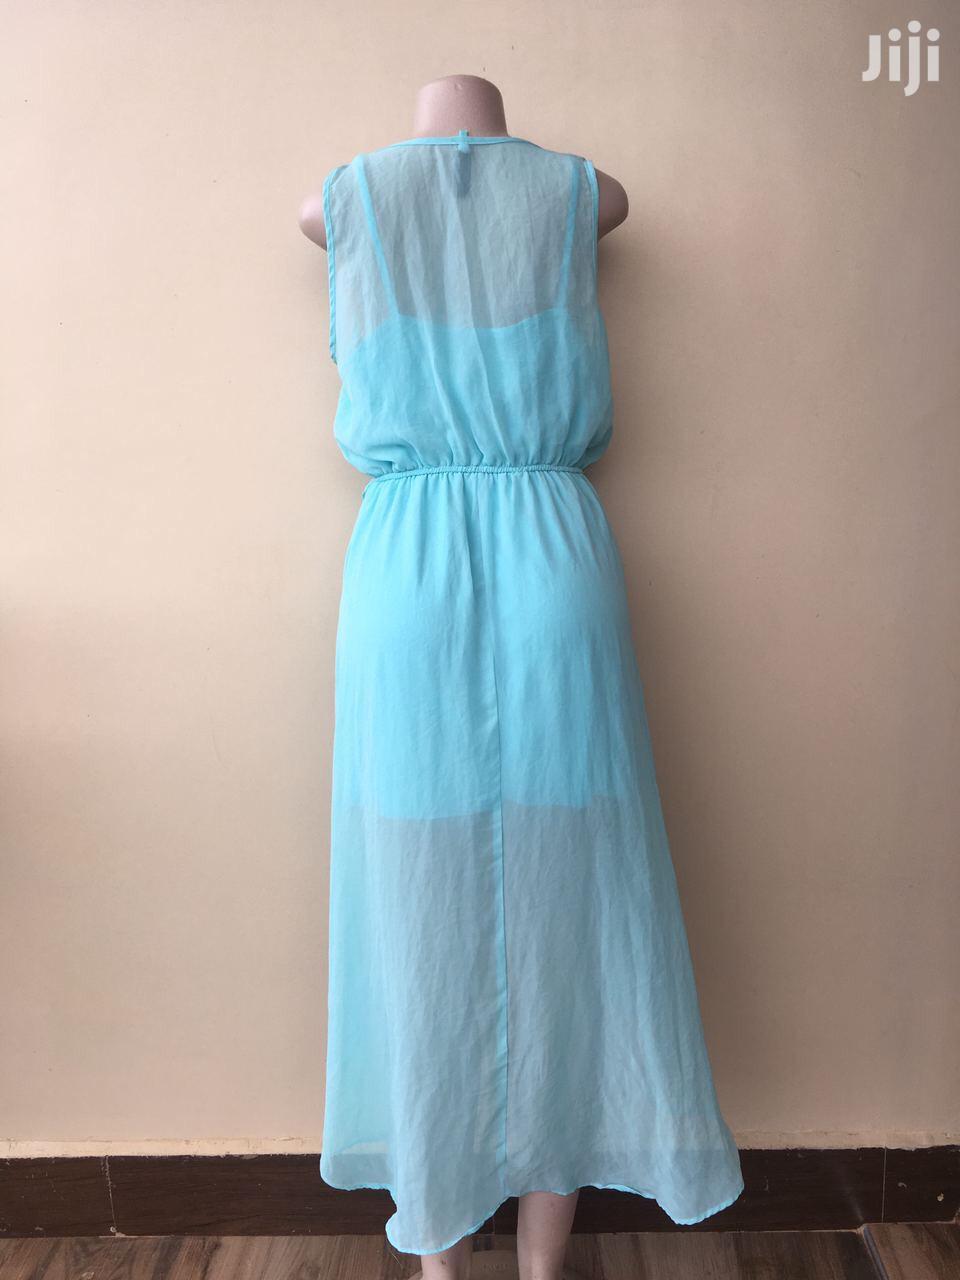 Aqua Blue High Low Dress | Clothing for sale in Morogoro Rural, Morogoro Region, Tanzania